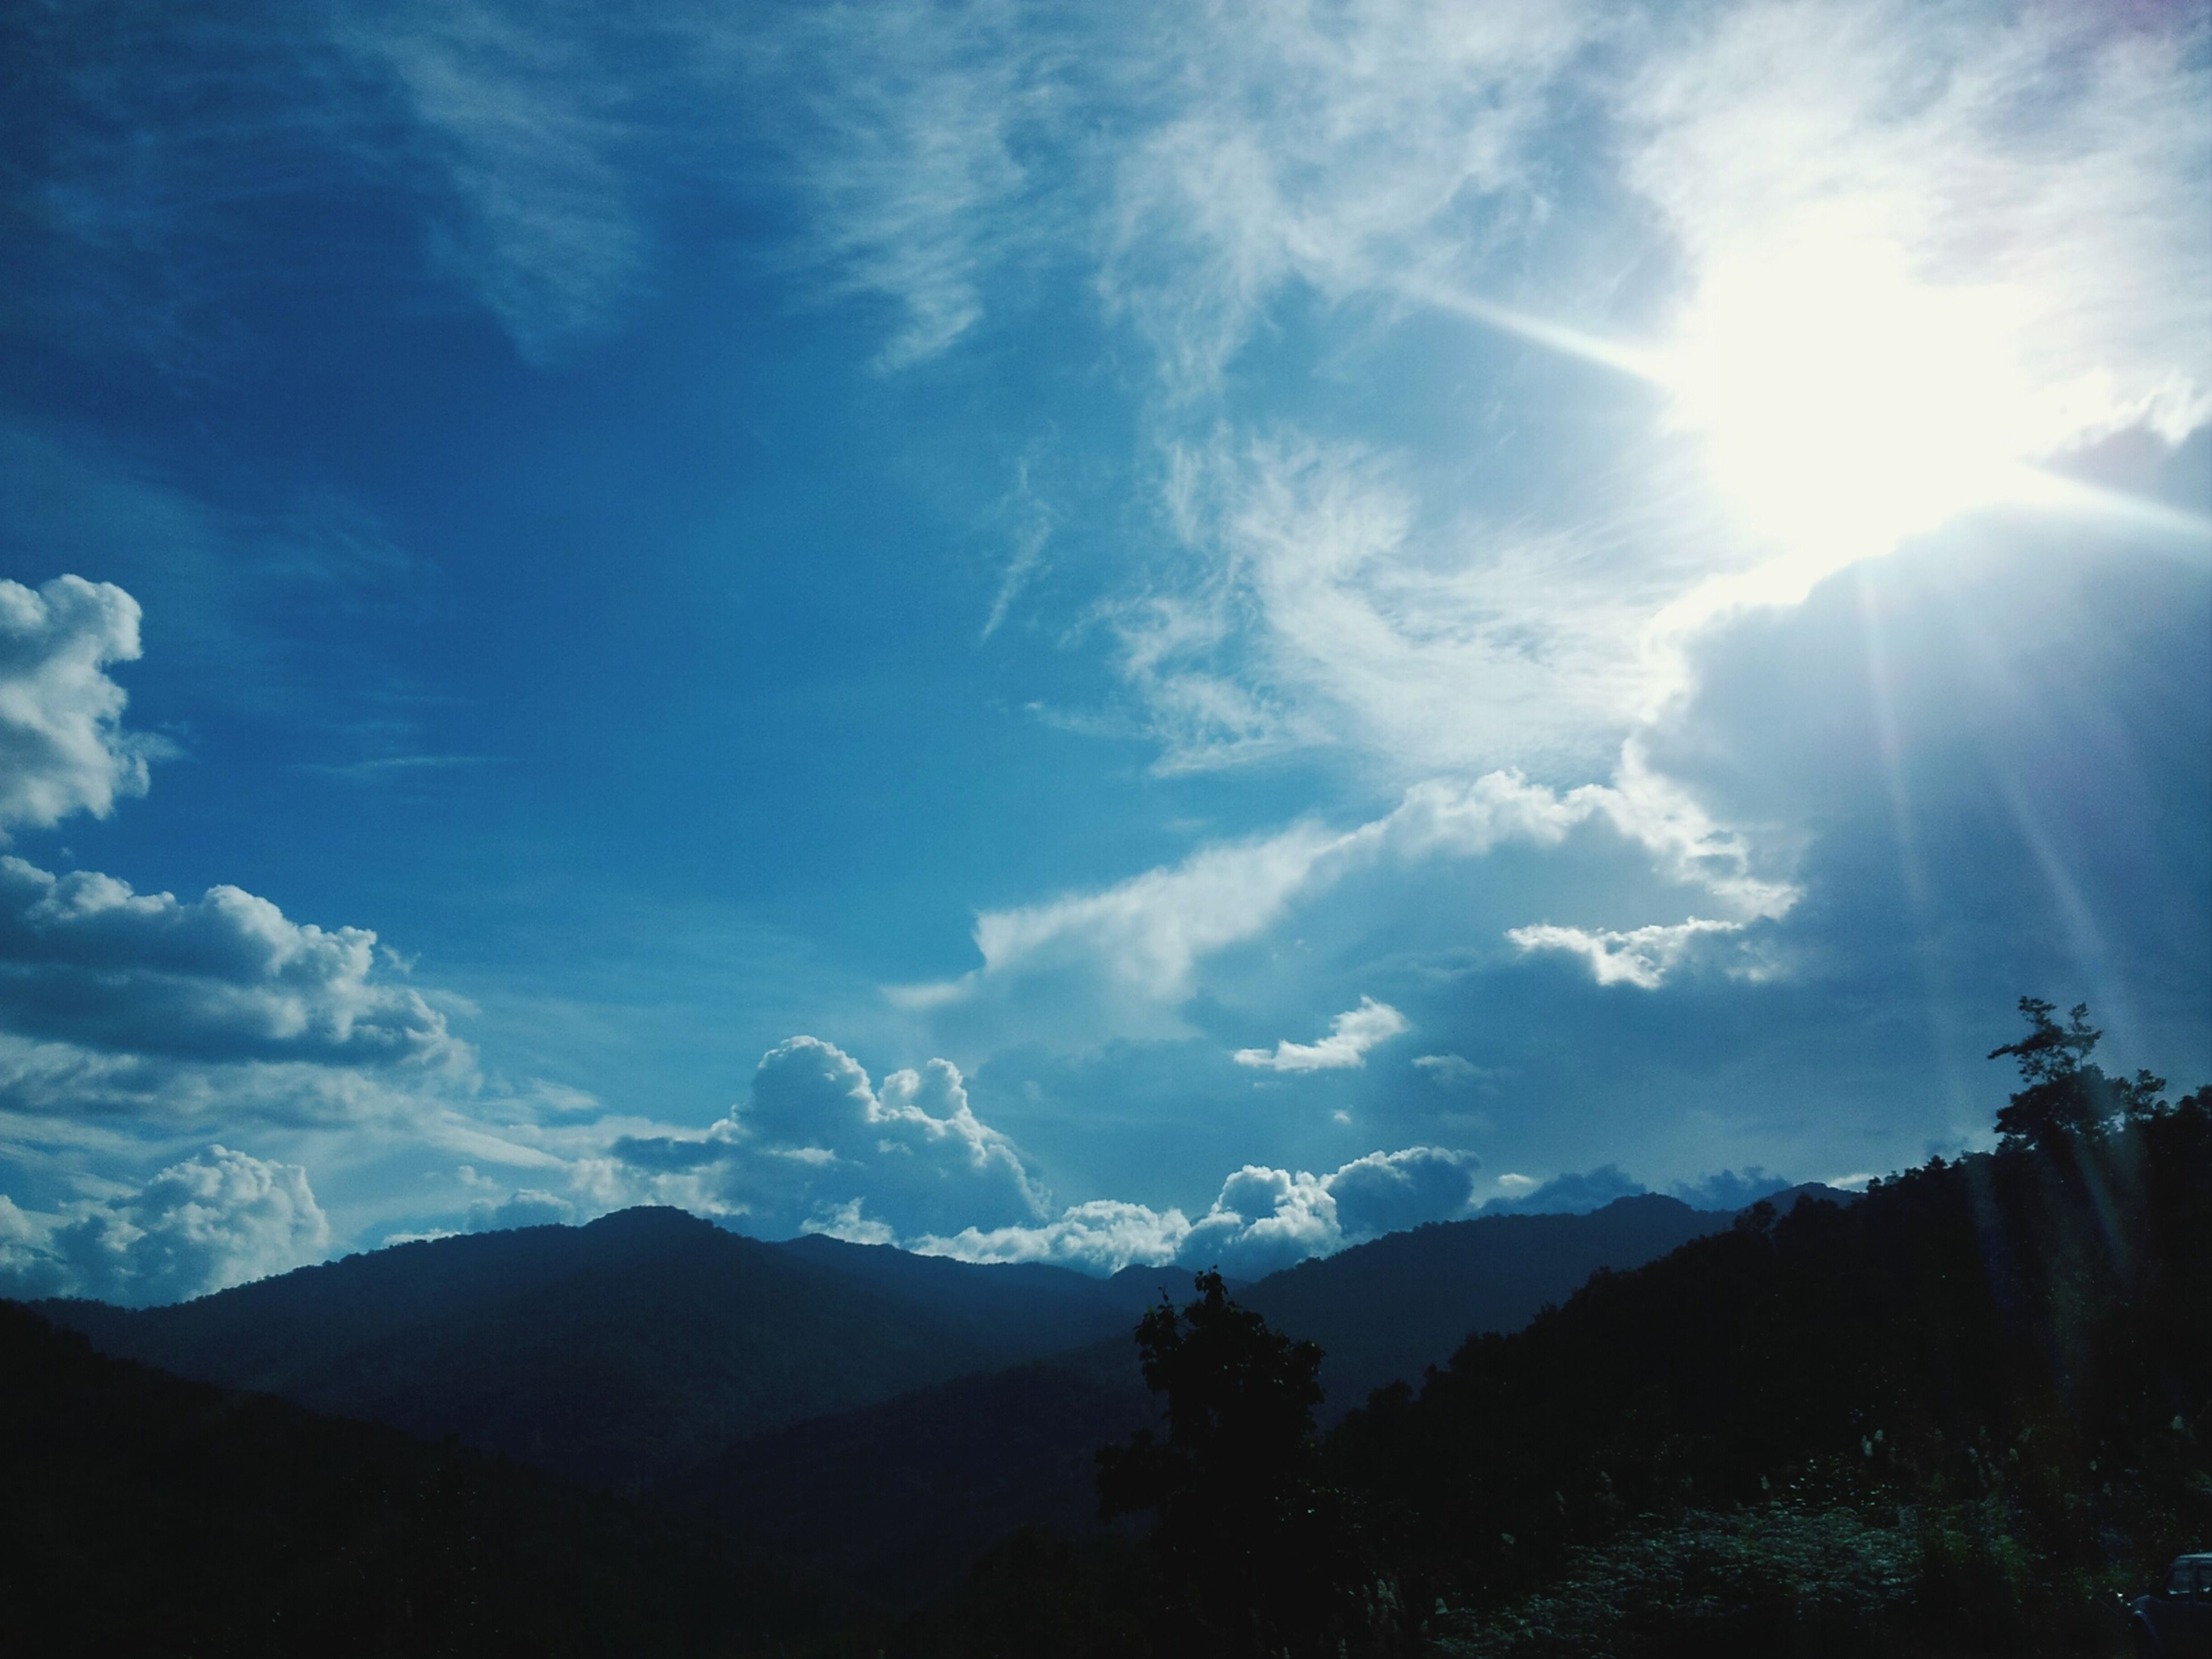 mountain, sun, sunbeam, tranquil scene, tranquility, scenics, beauty in nature, sky, mountain range, sunlight, nature, landscape, lens flare, cloud - sky, tree, silhouette, idyllic, non-urban scene, cloud, outdoors